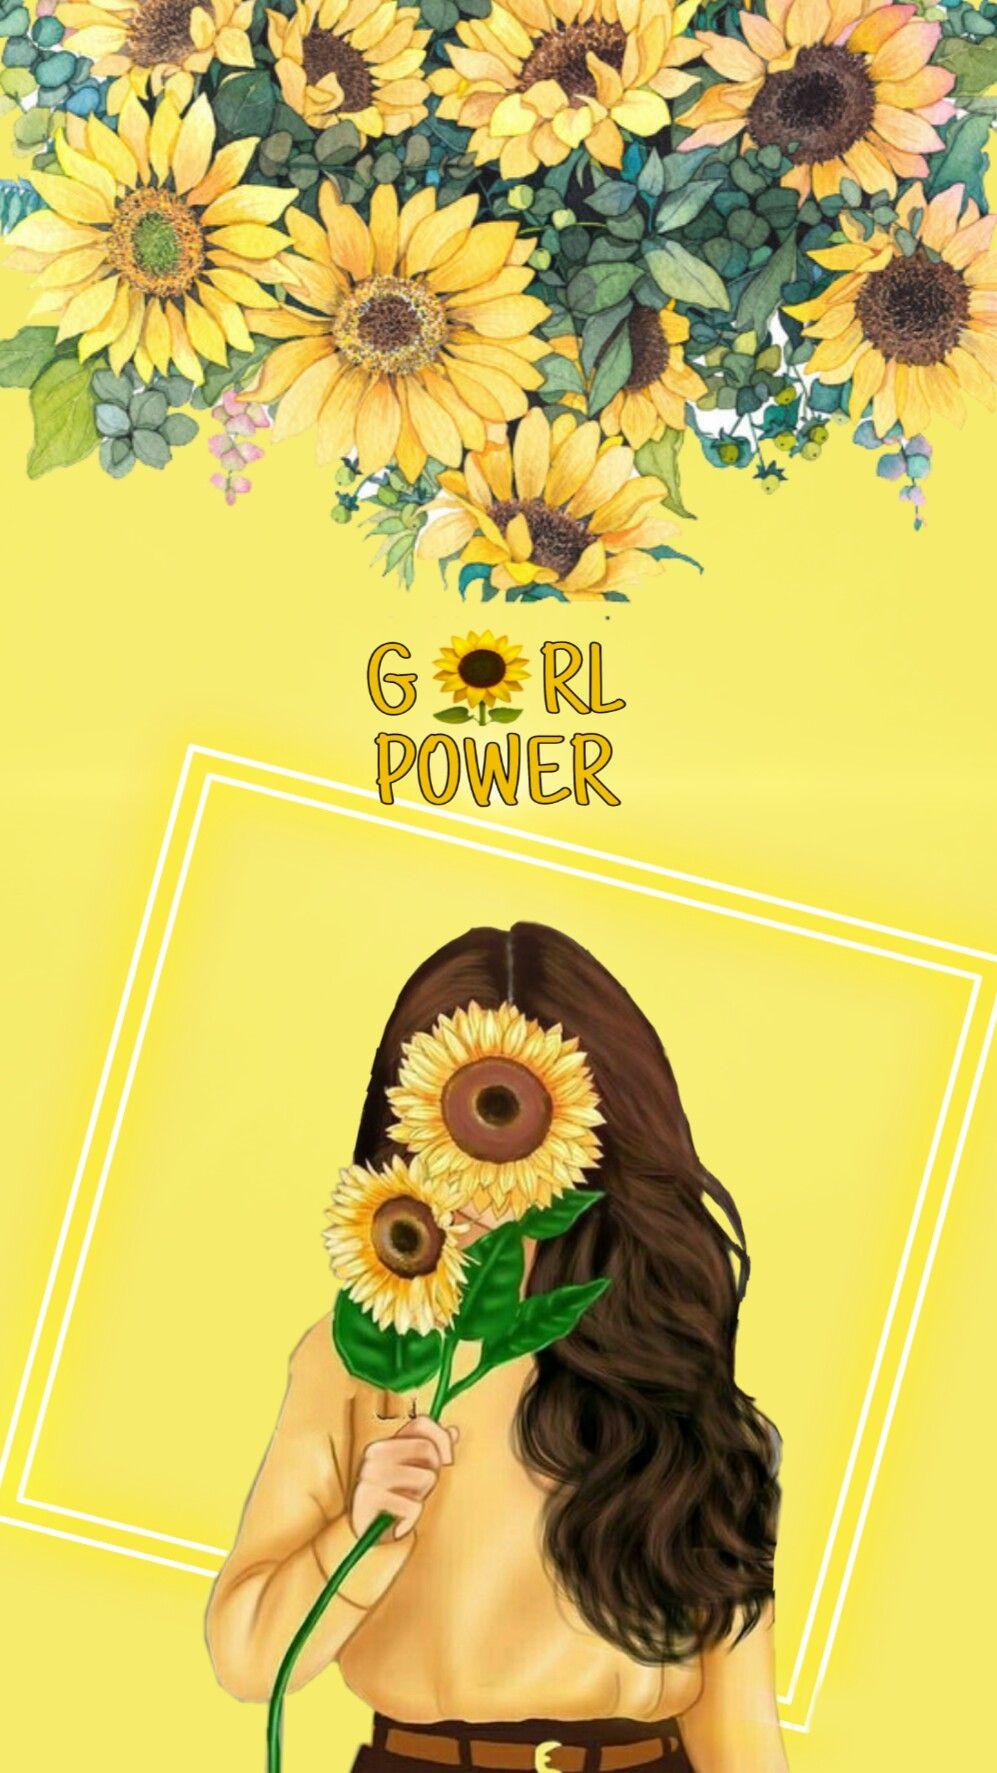 Art Girl Cartoon Beautiful Look Sunflower Girl Power Wallpaper Girl Cartoon Power Wallpaper Sunflower Illustration